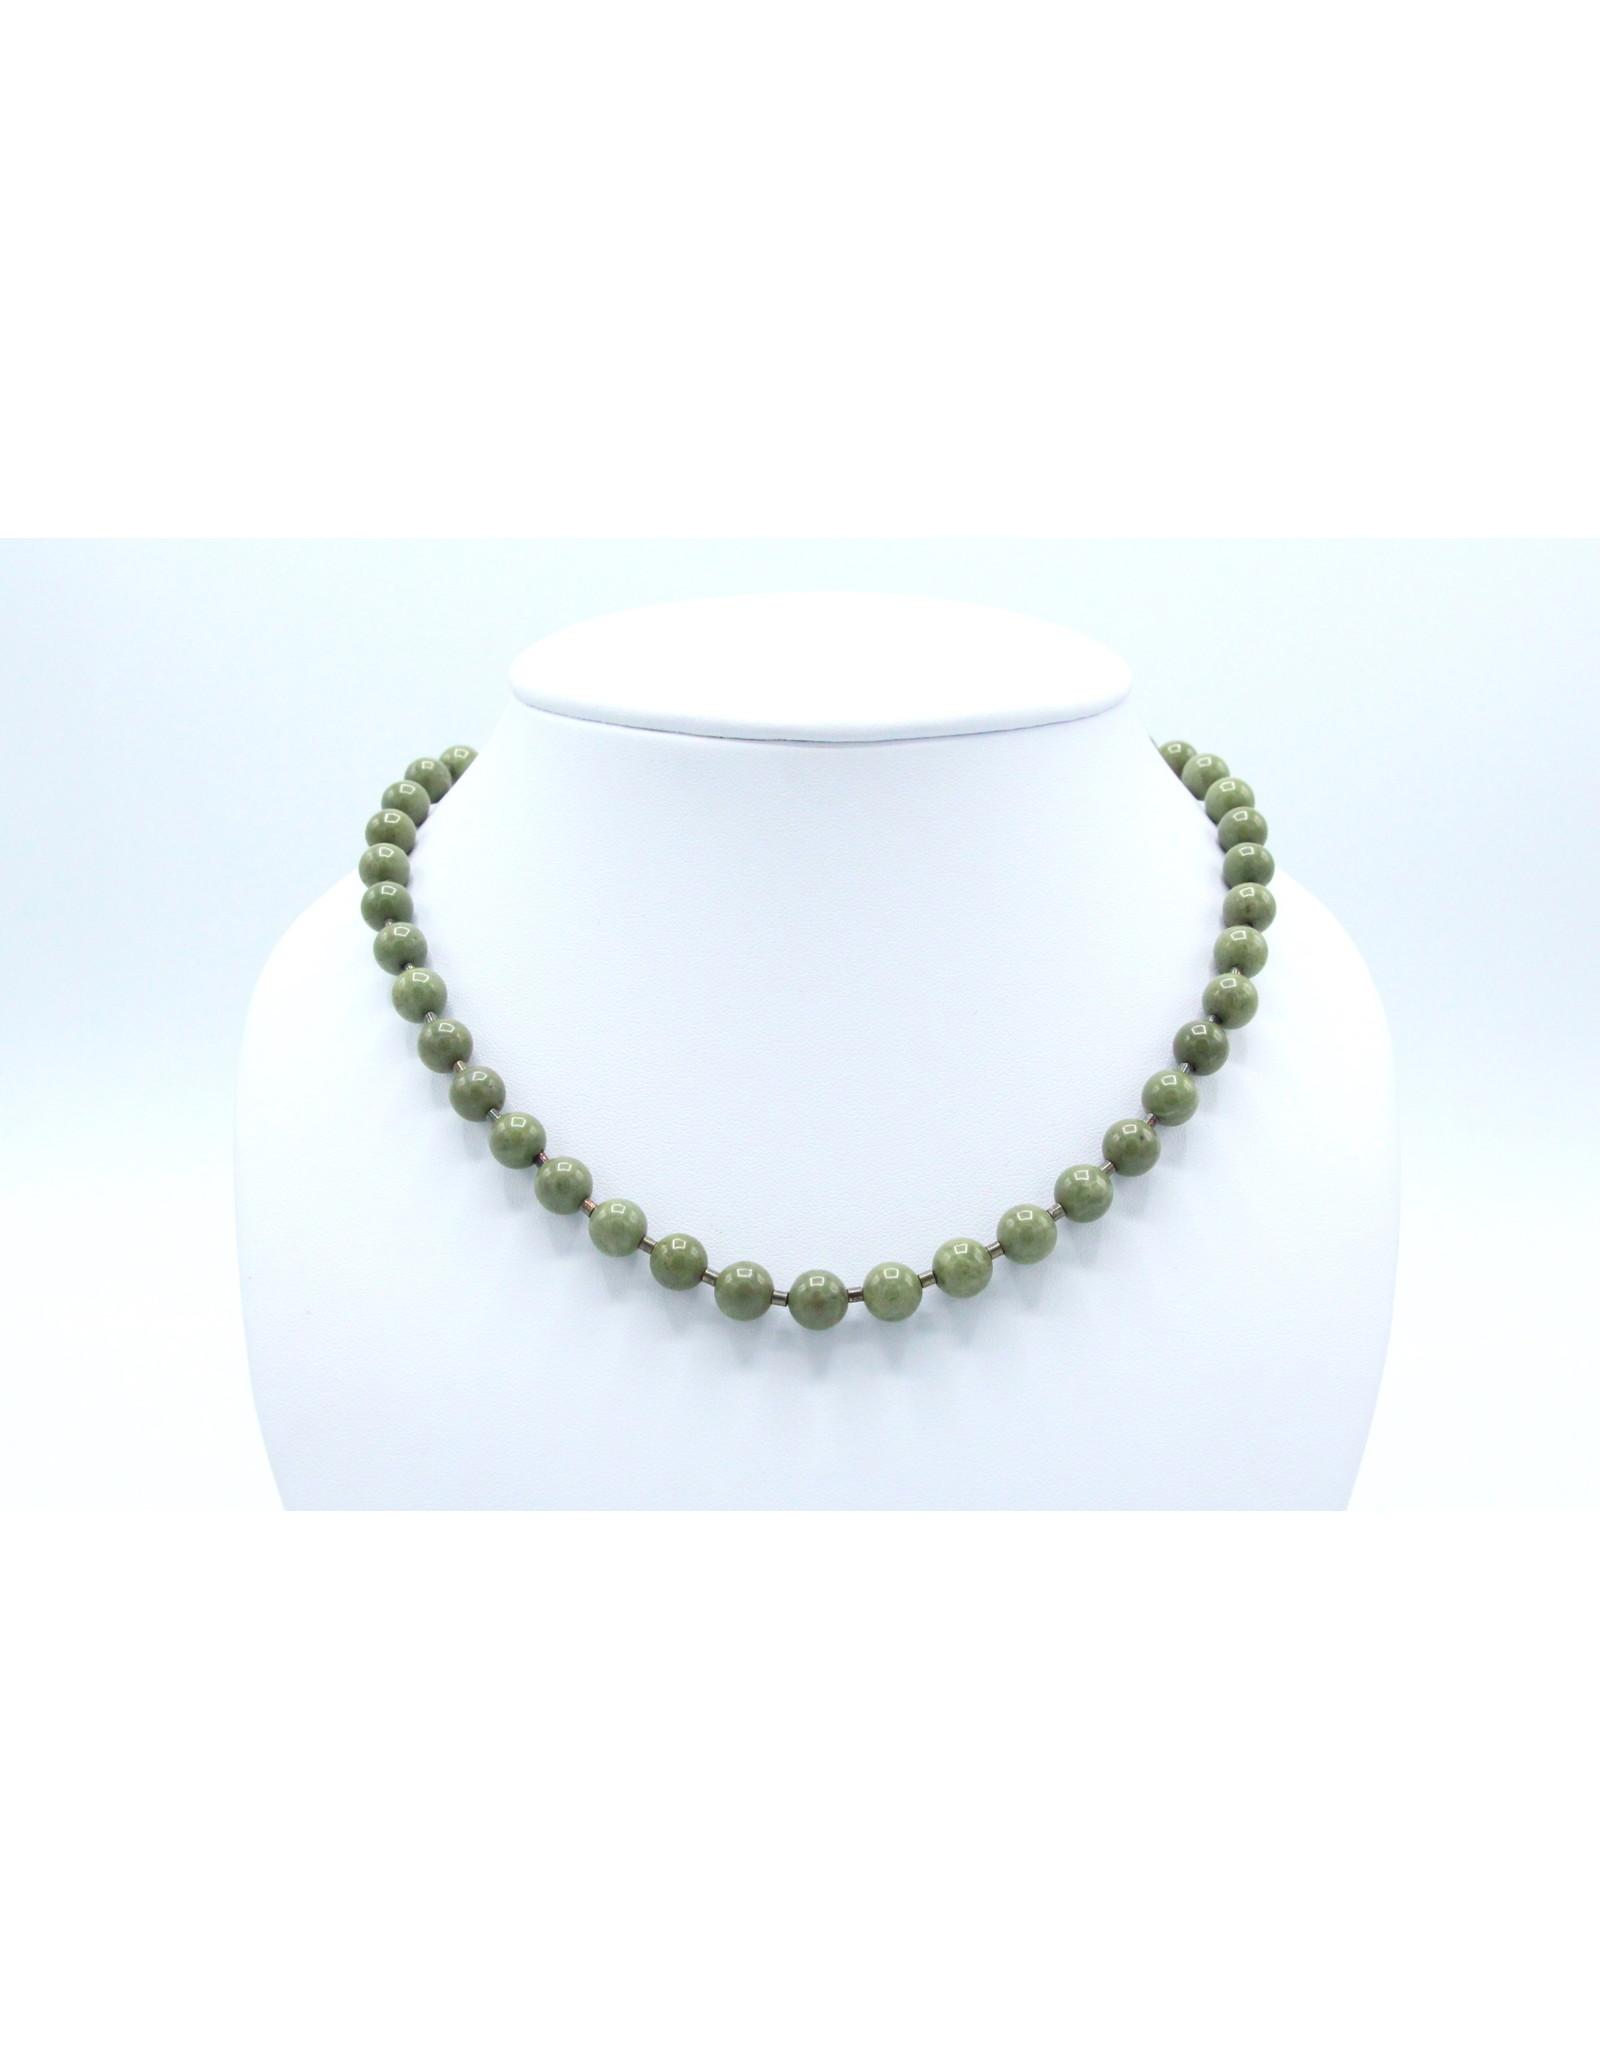 Epidote Necklace - NEPI01